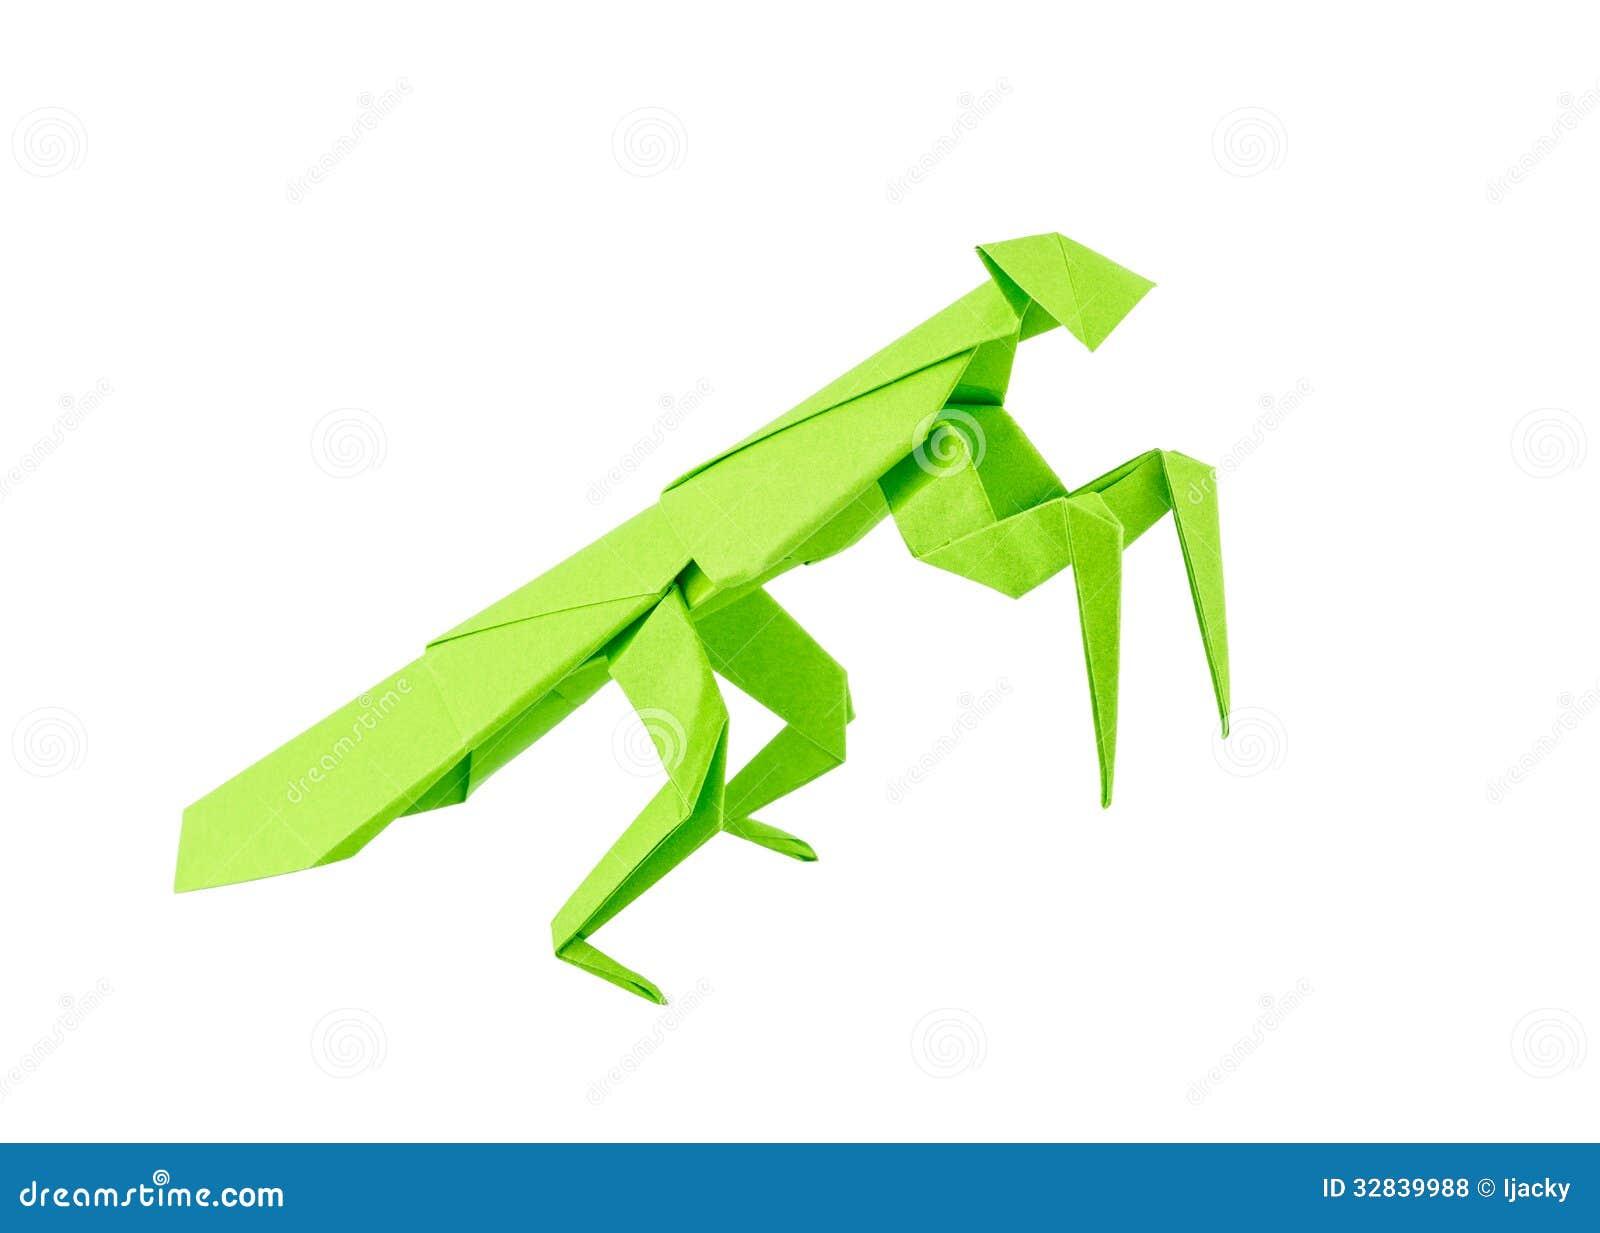 Origami Mantis Isolated On White Background Royalty Free Stock Photos